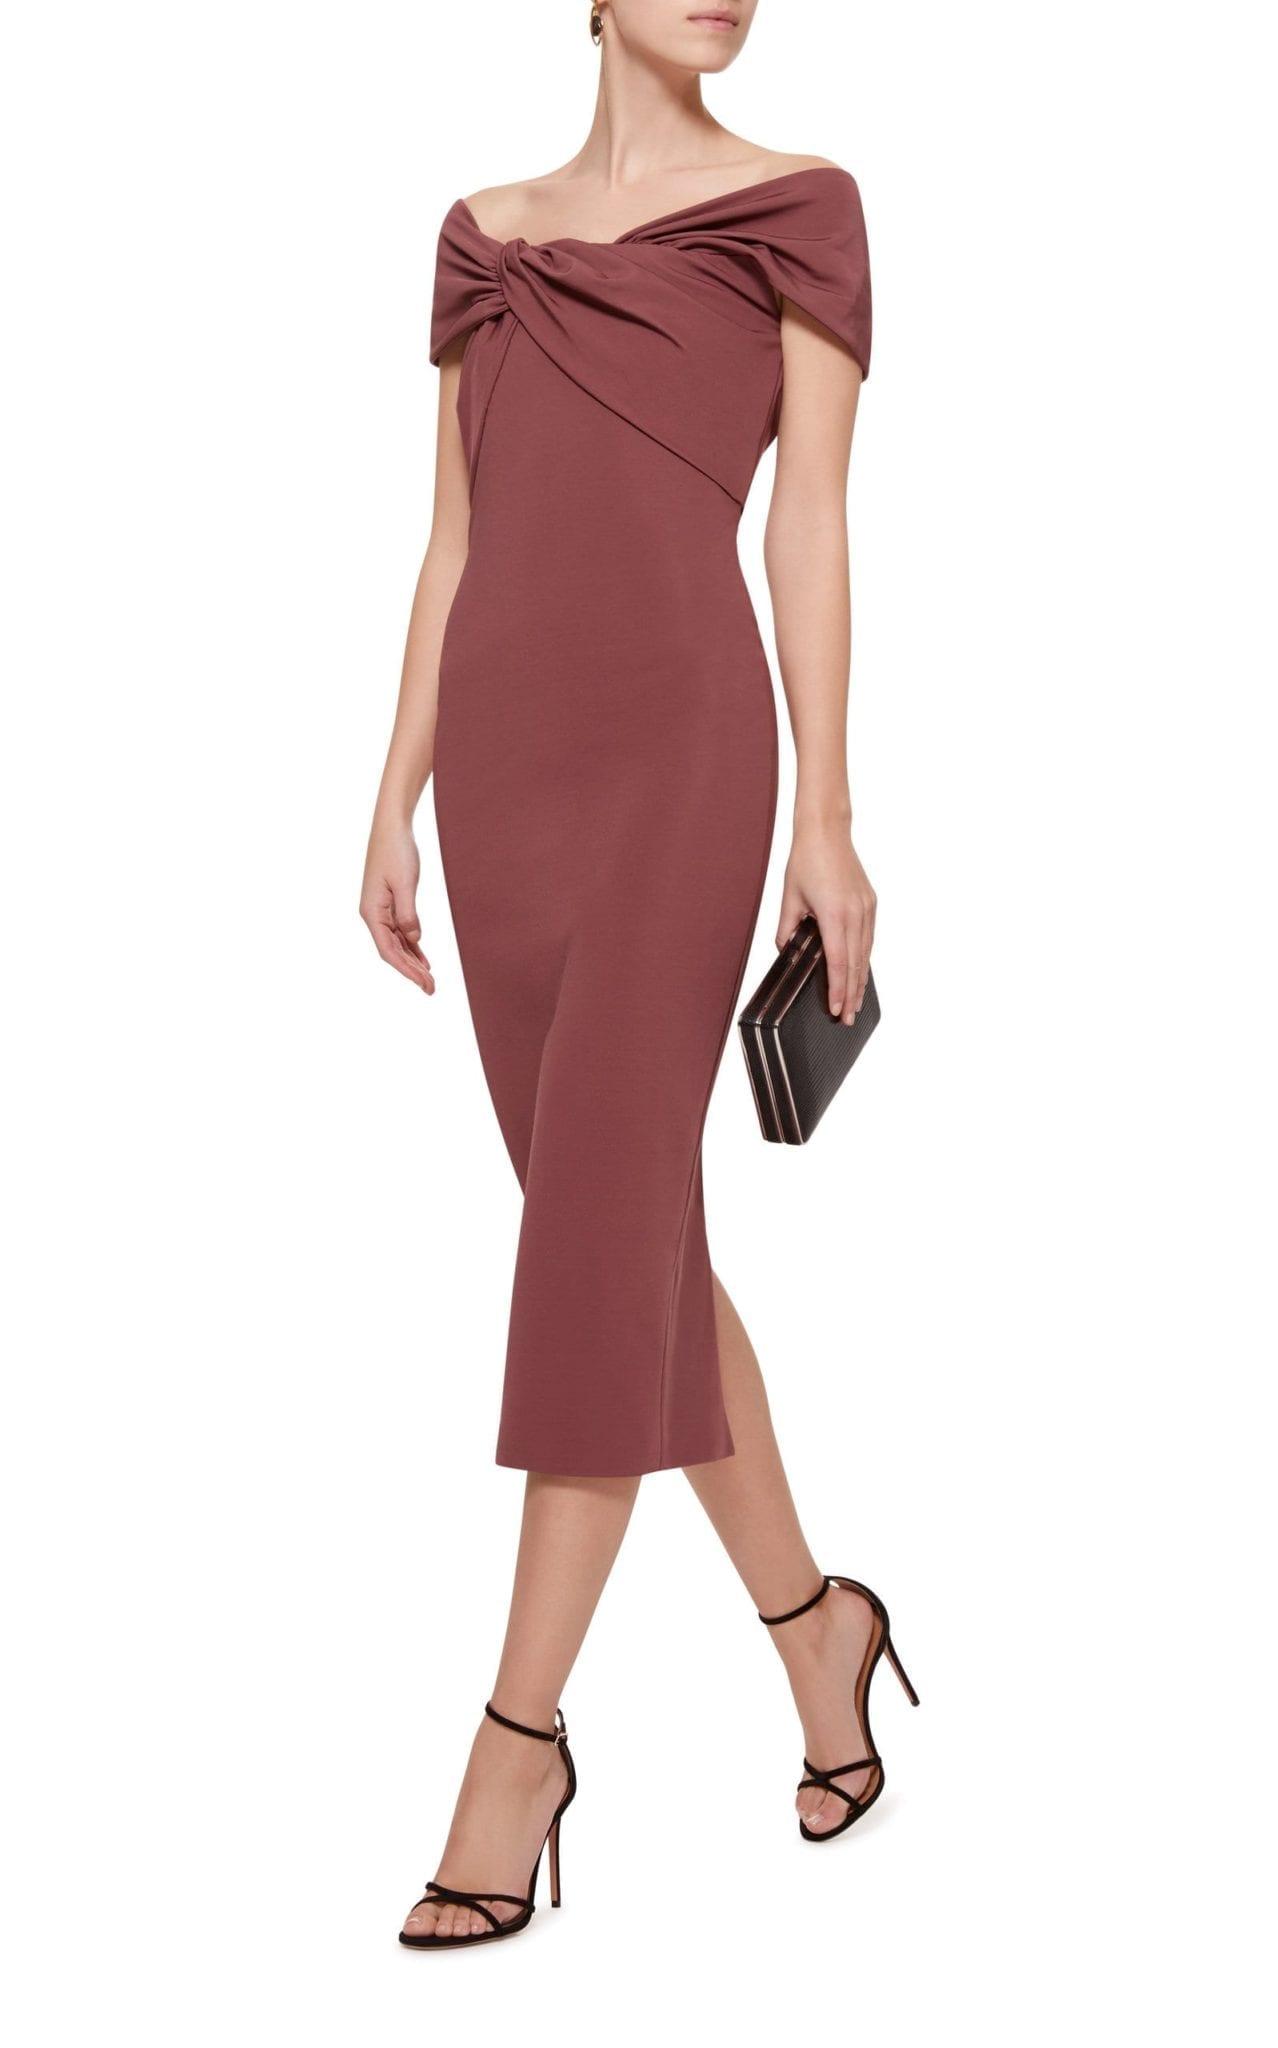 ba7667787790 CUSHNIE ET OCHS Off-The-Shoulder Stretch-Crepe Midi Brown Dress - We ...